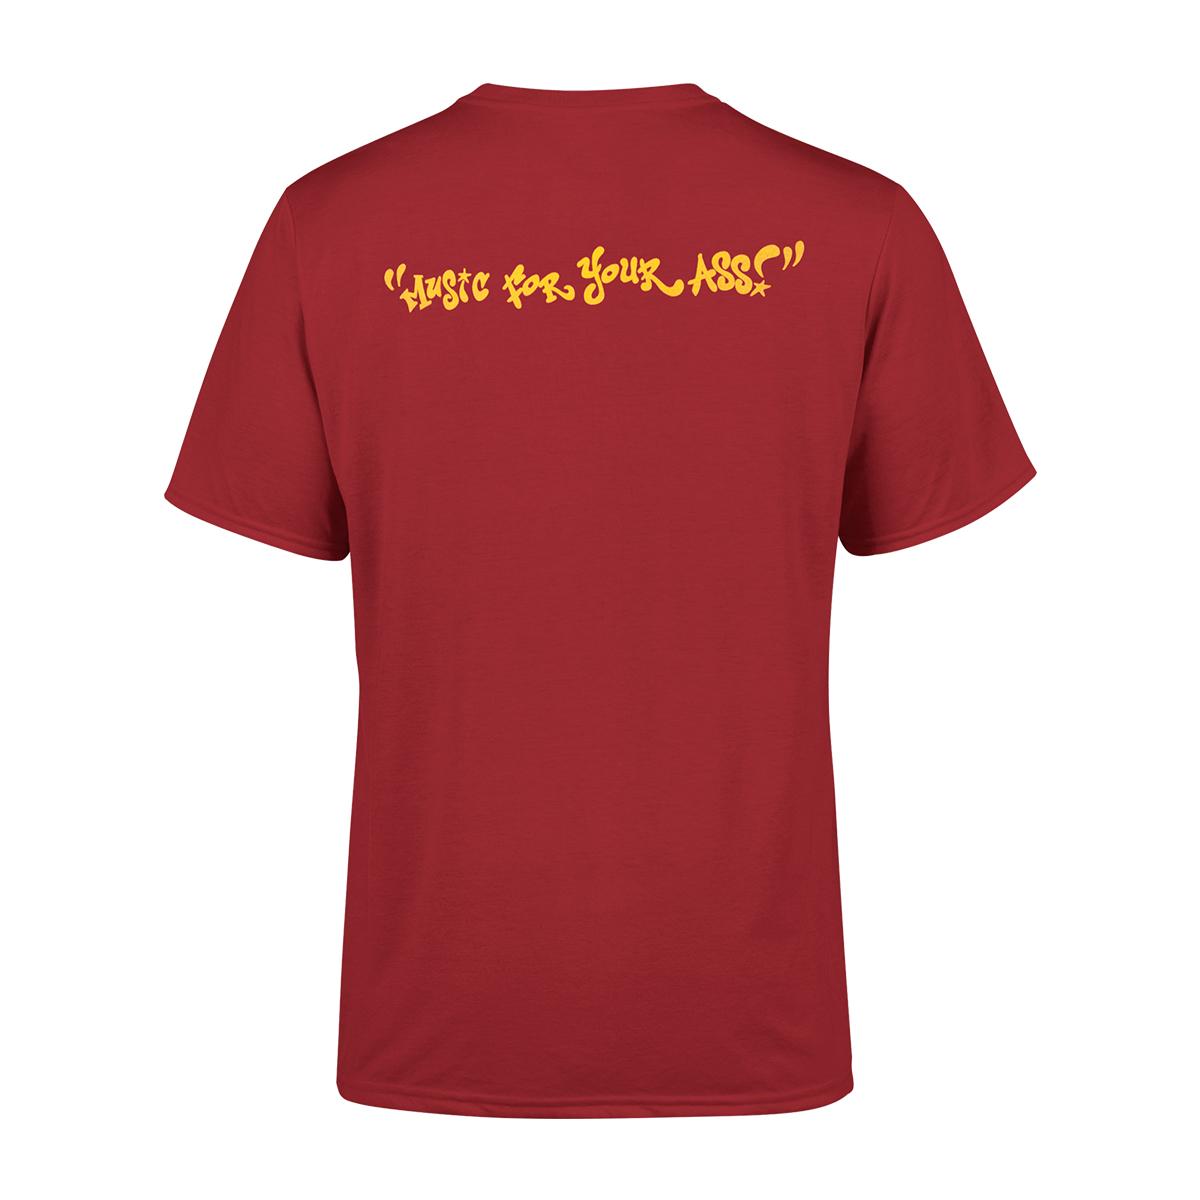 Music For Your Ass T-Shirt